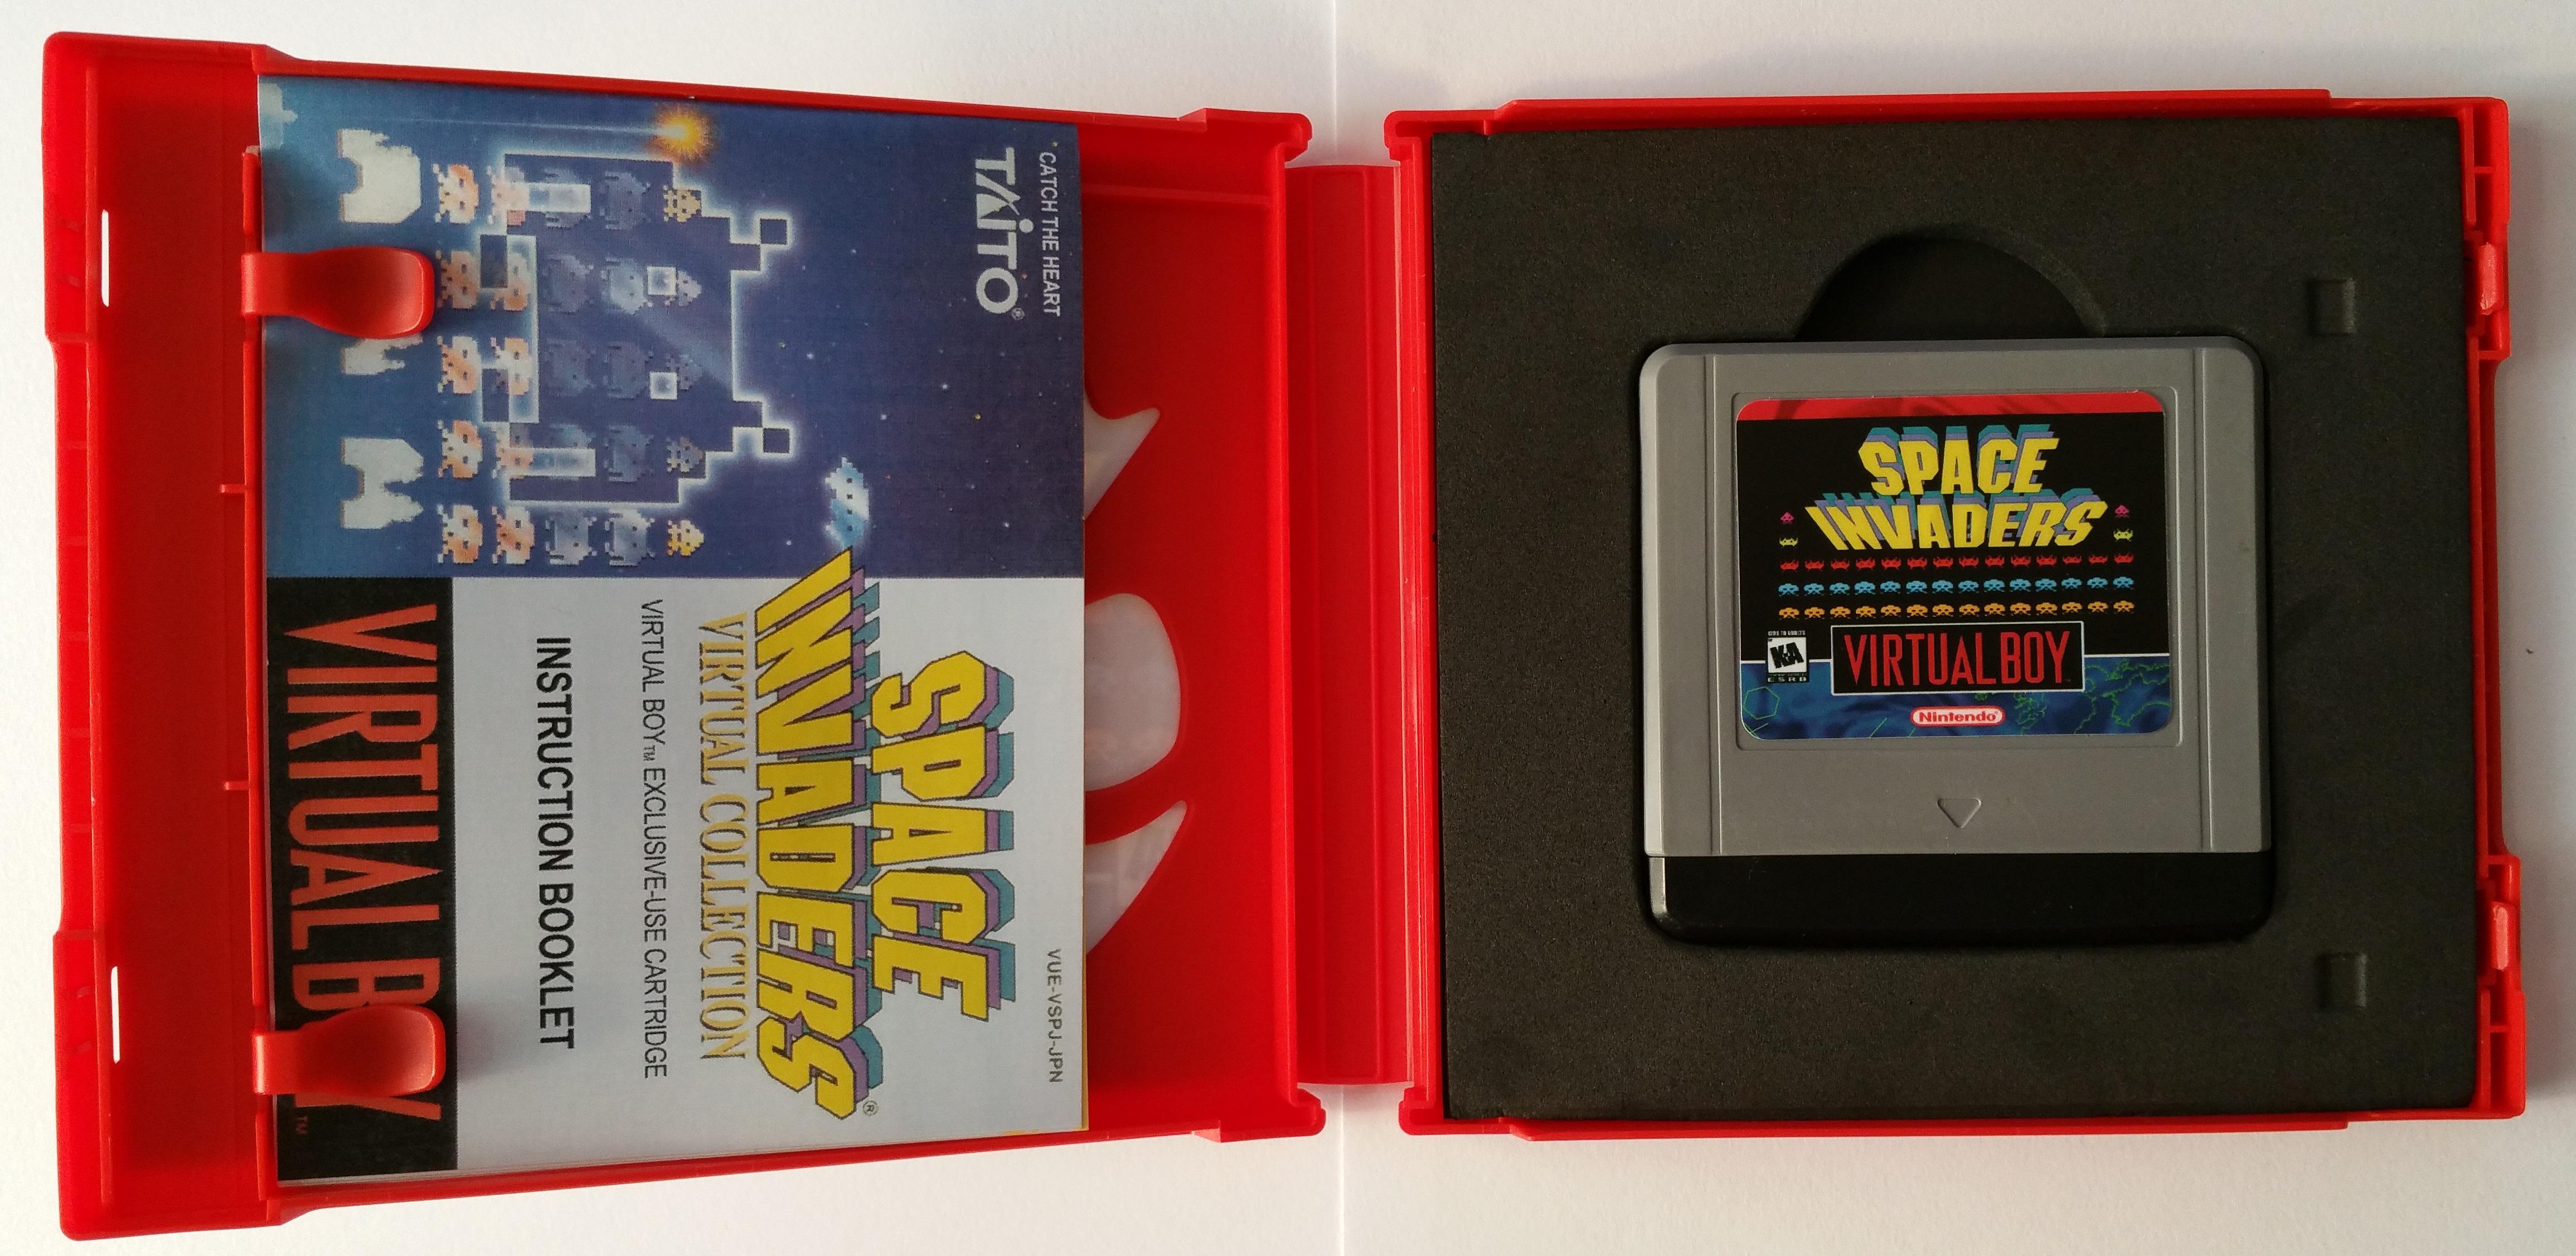 Space Invaders Custom Case insides